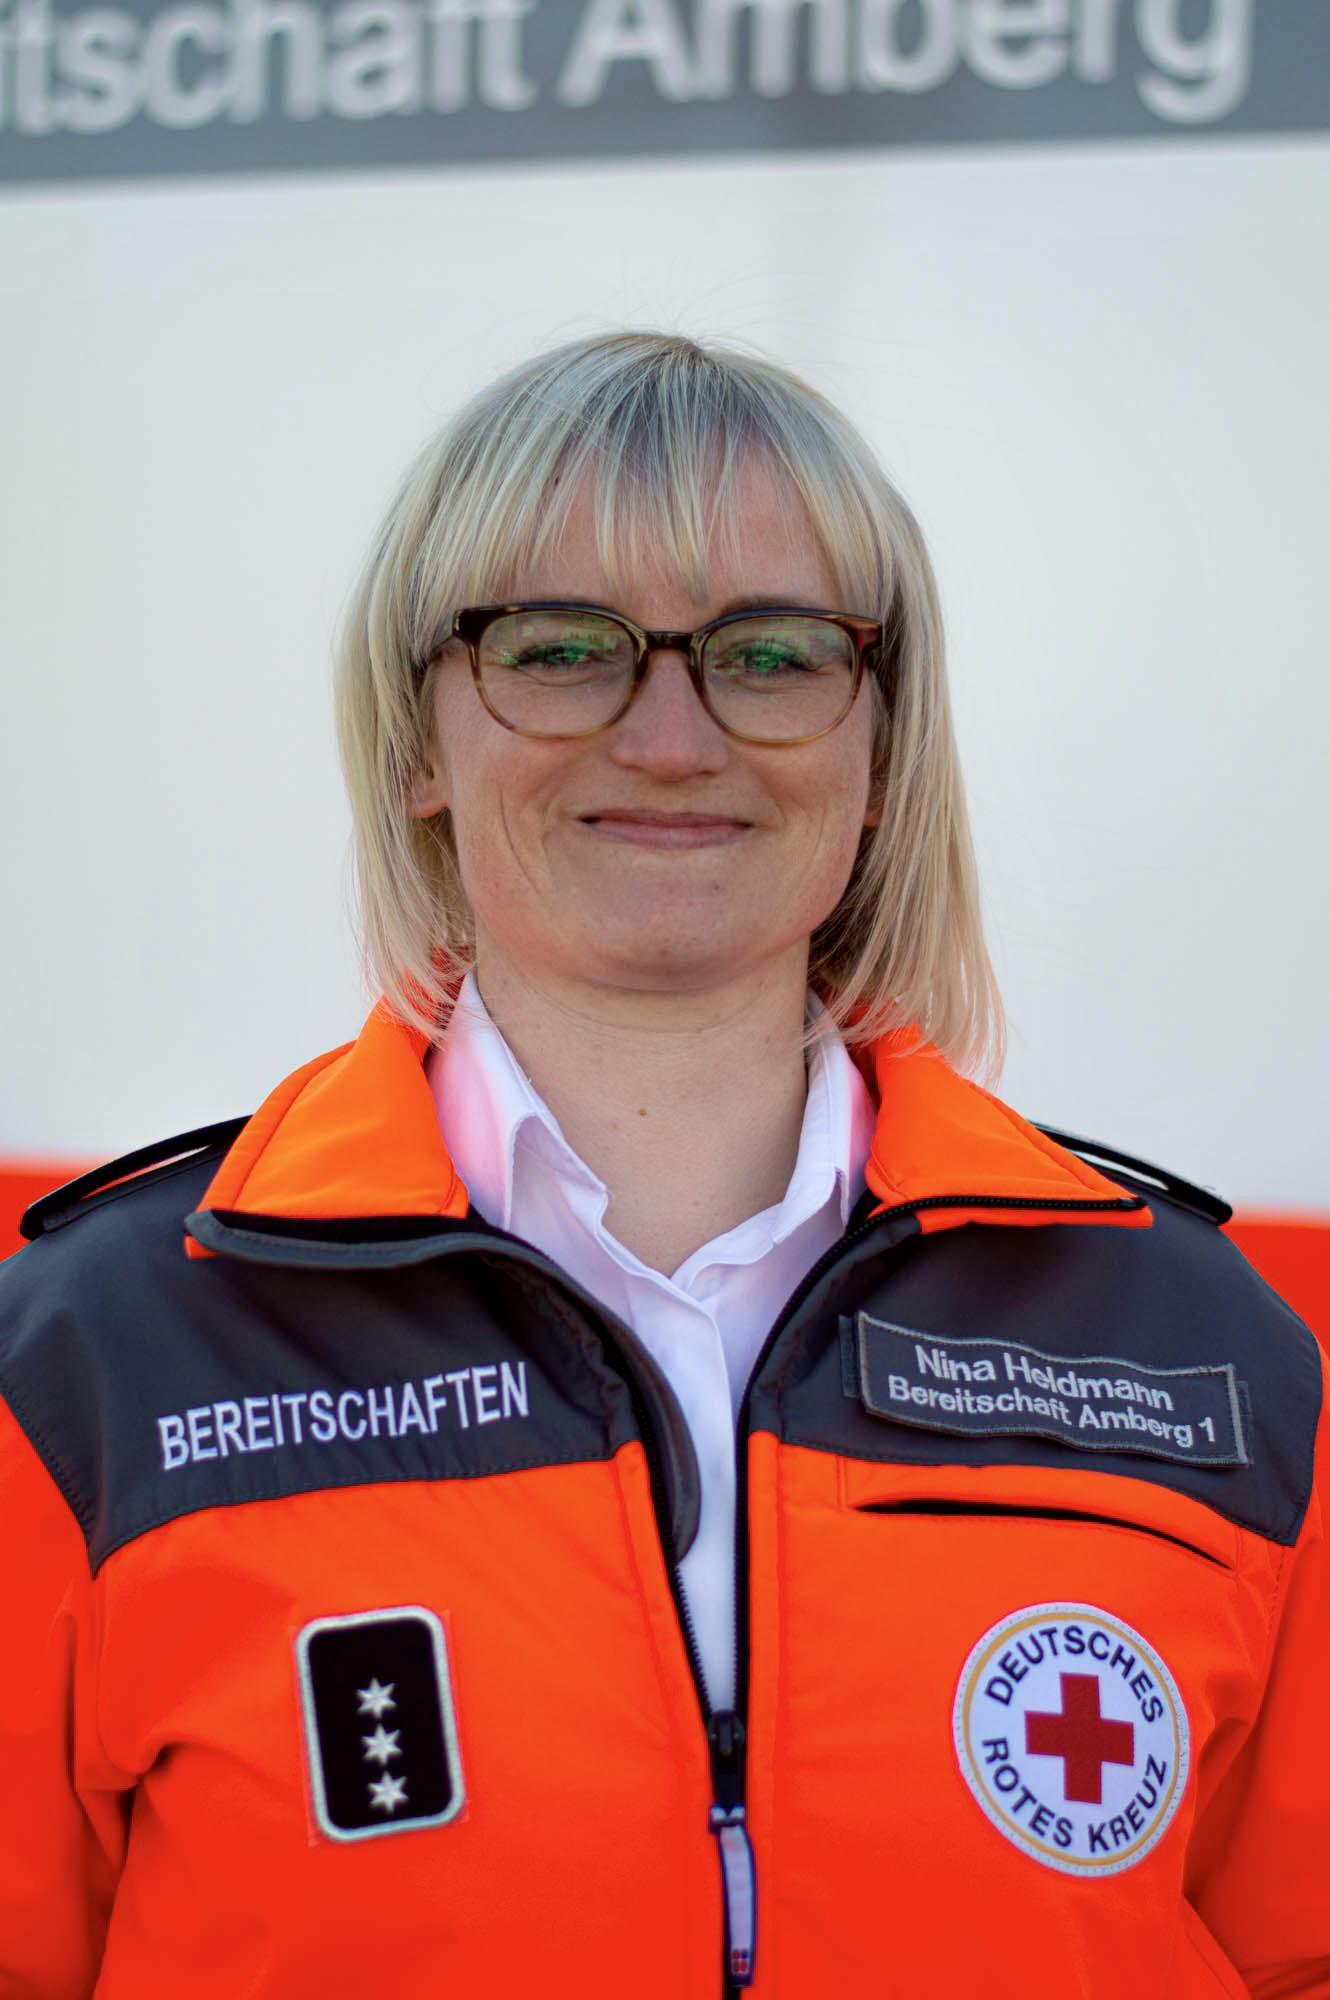 Nina Heldmann